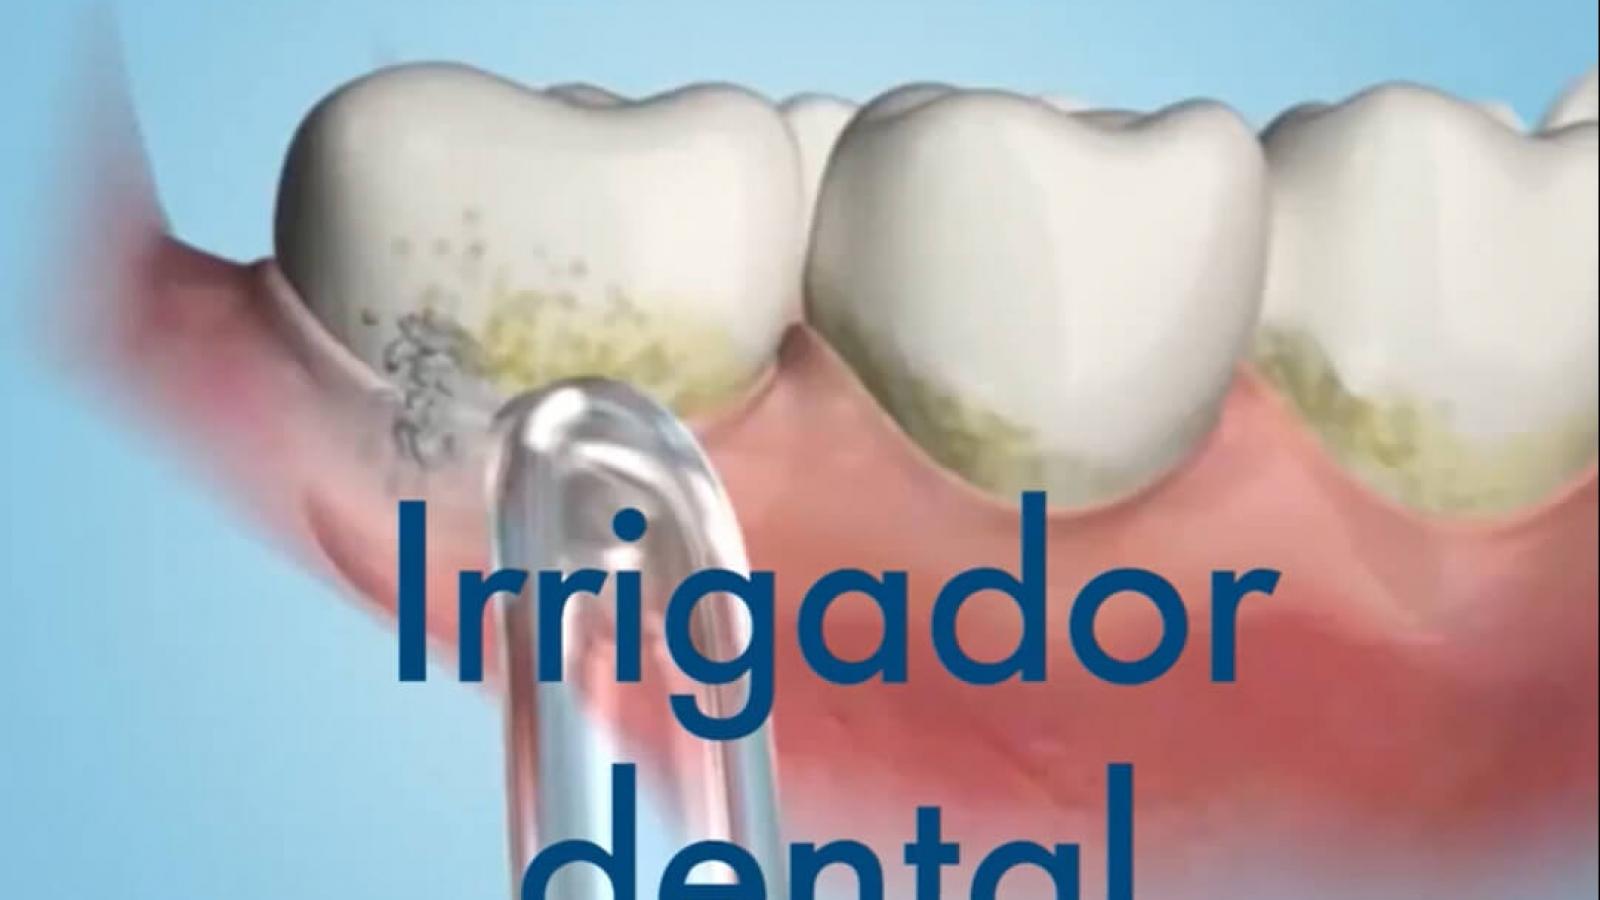 Post irrigador dental